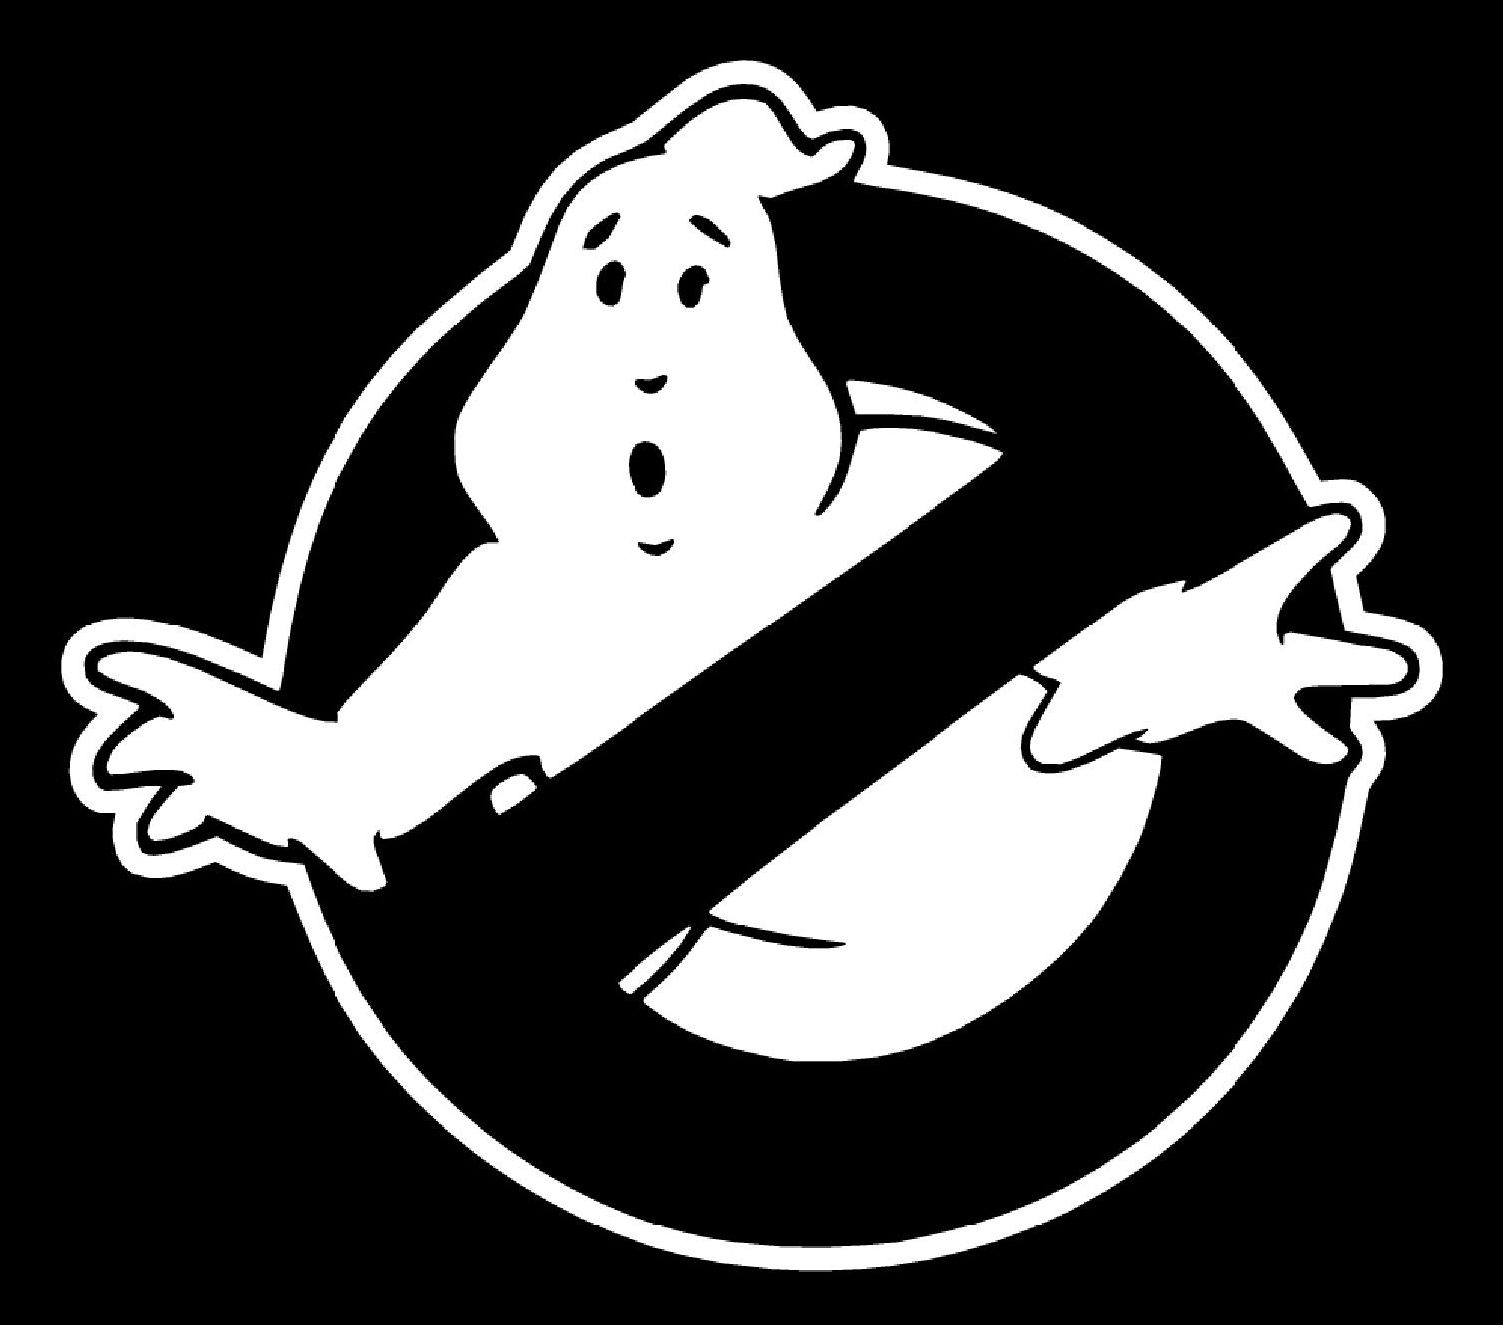 2 96 Ghostbusters Movie Slimer Ghost Vinyl Decal Sticker Bumper Window Wall Car Ebay Home Garden Vinyl Decals Bumper Stickers Slimer Ghost [ 1325 x 1503 Pixel ]